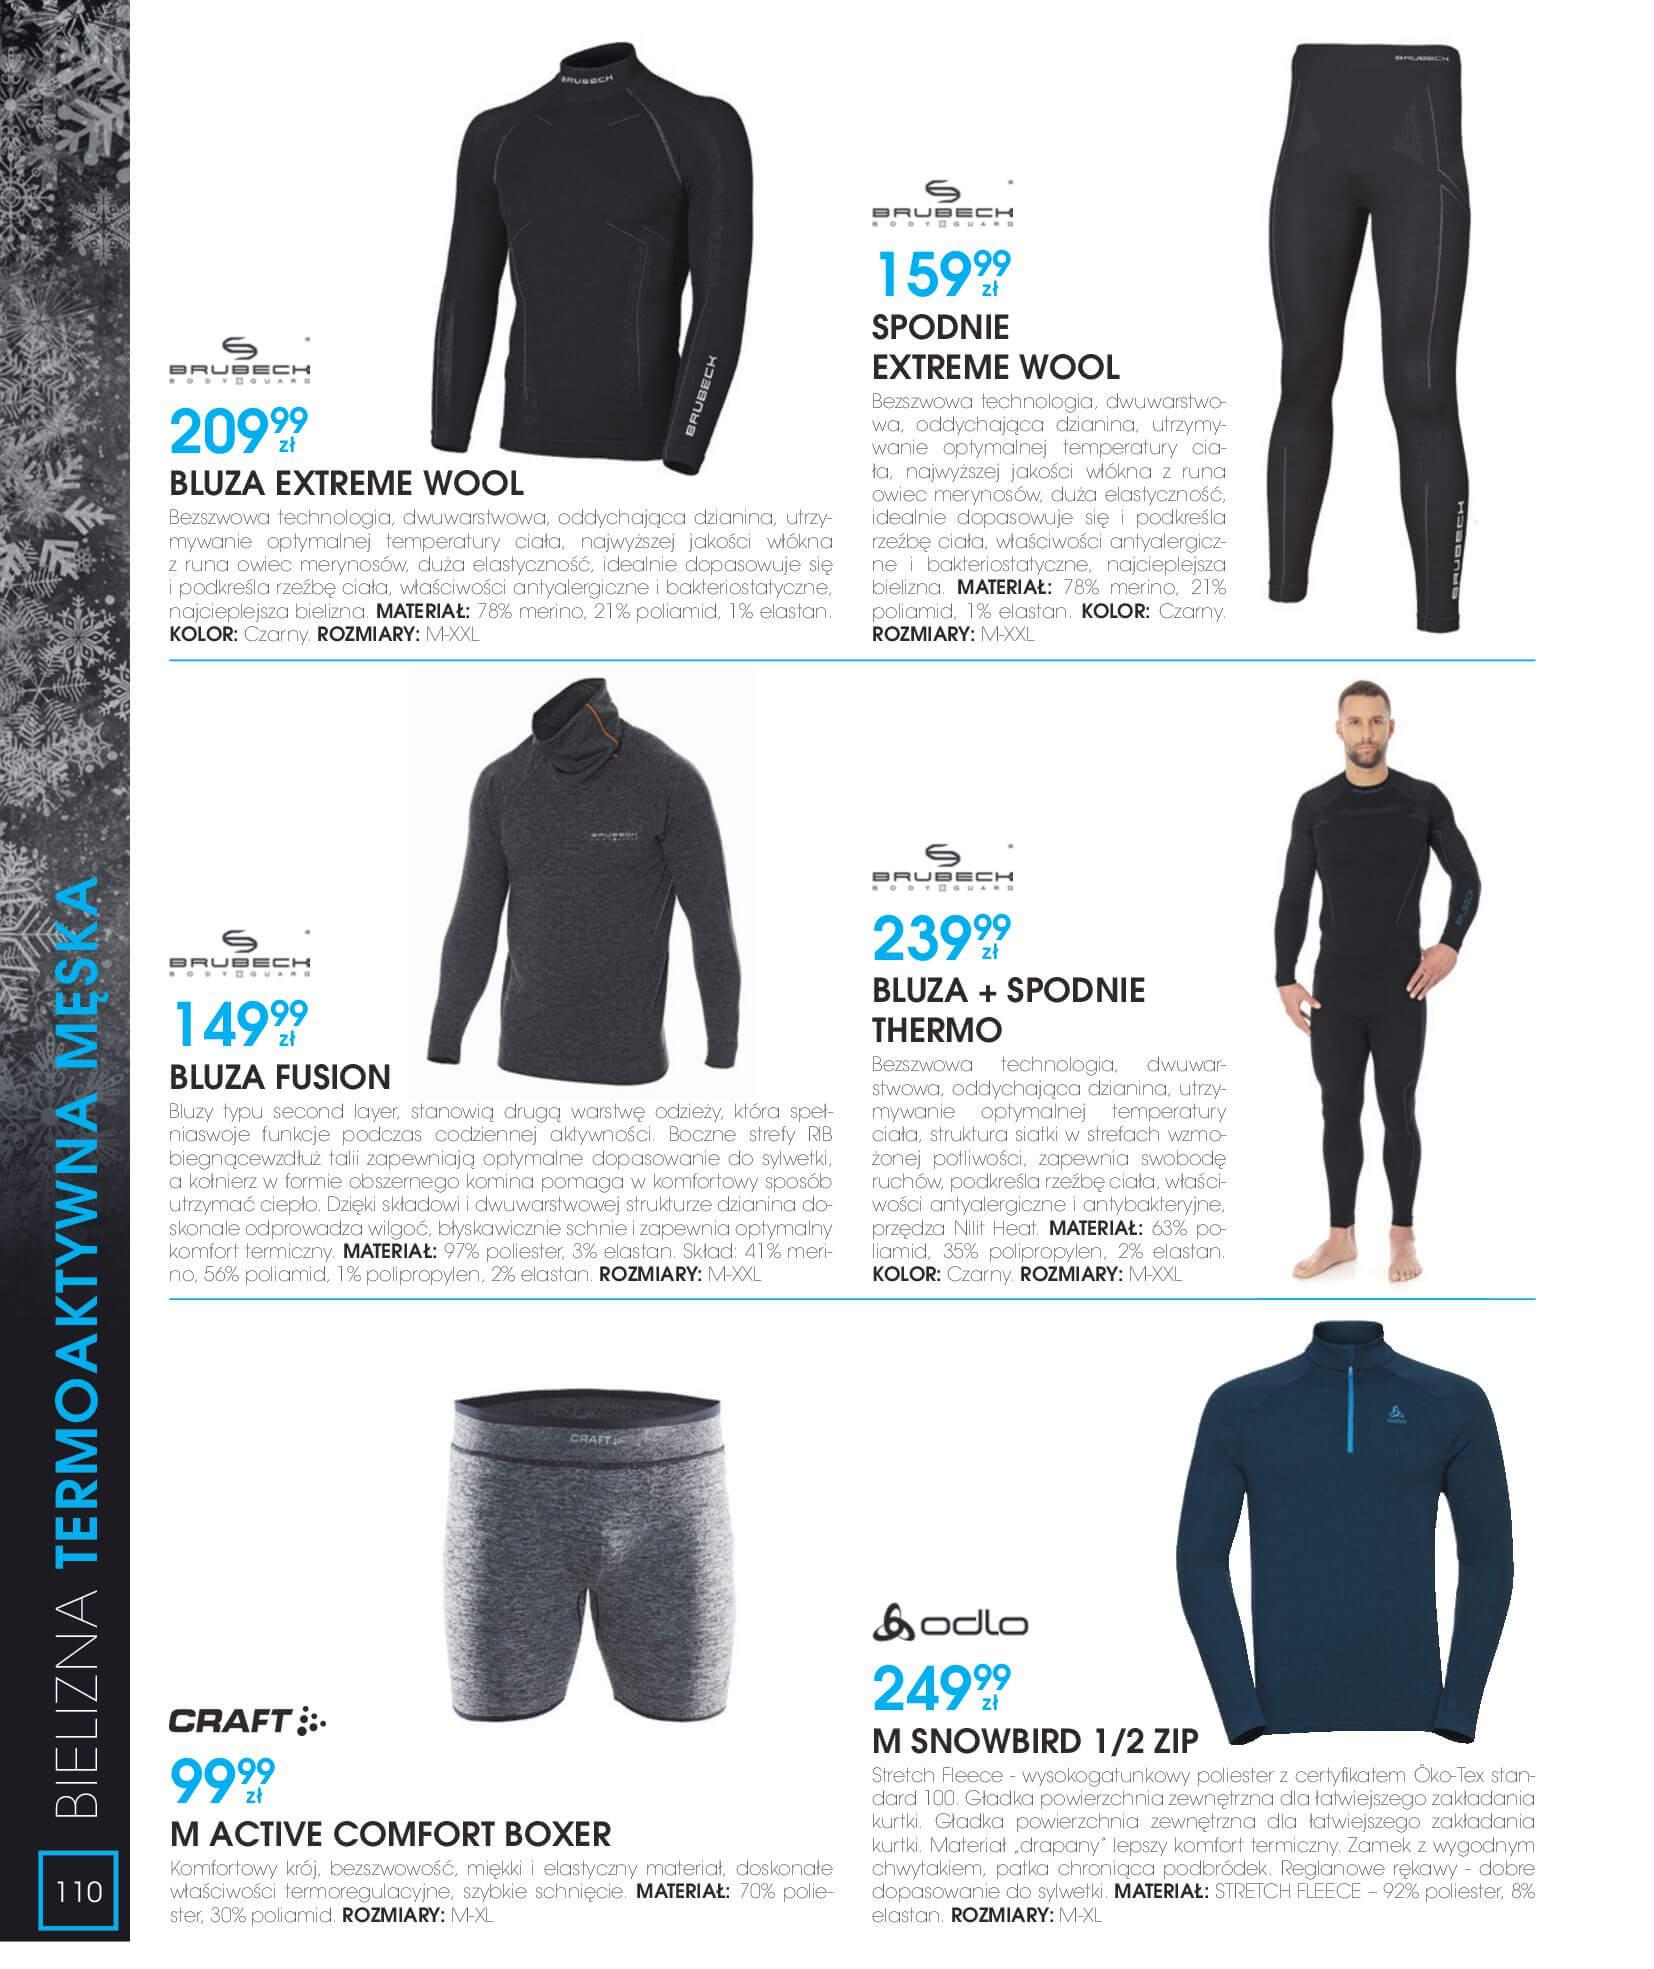 Gazetka Go Sport - Katalog Zima 2017/2018-12.11.2017-28.02.2018-page-110